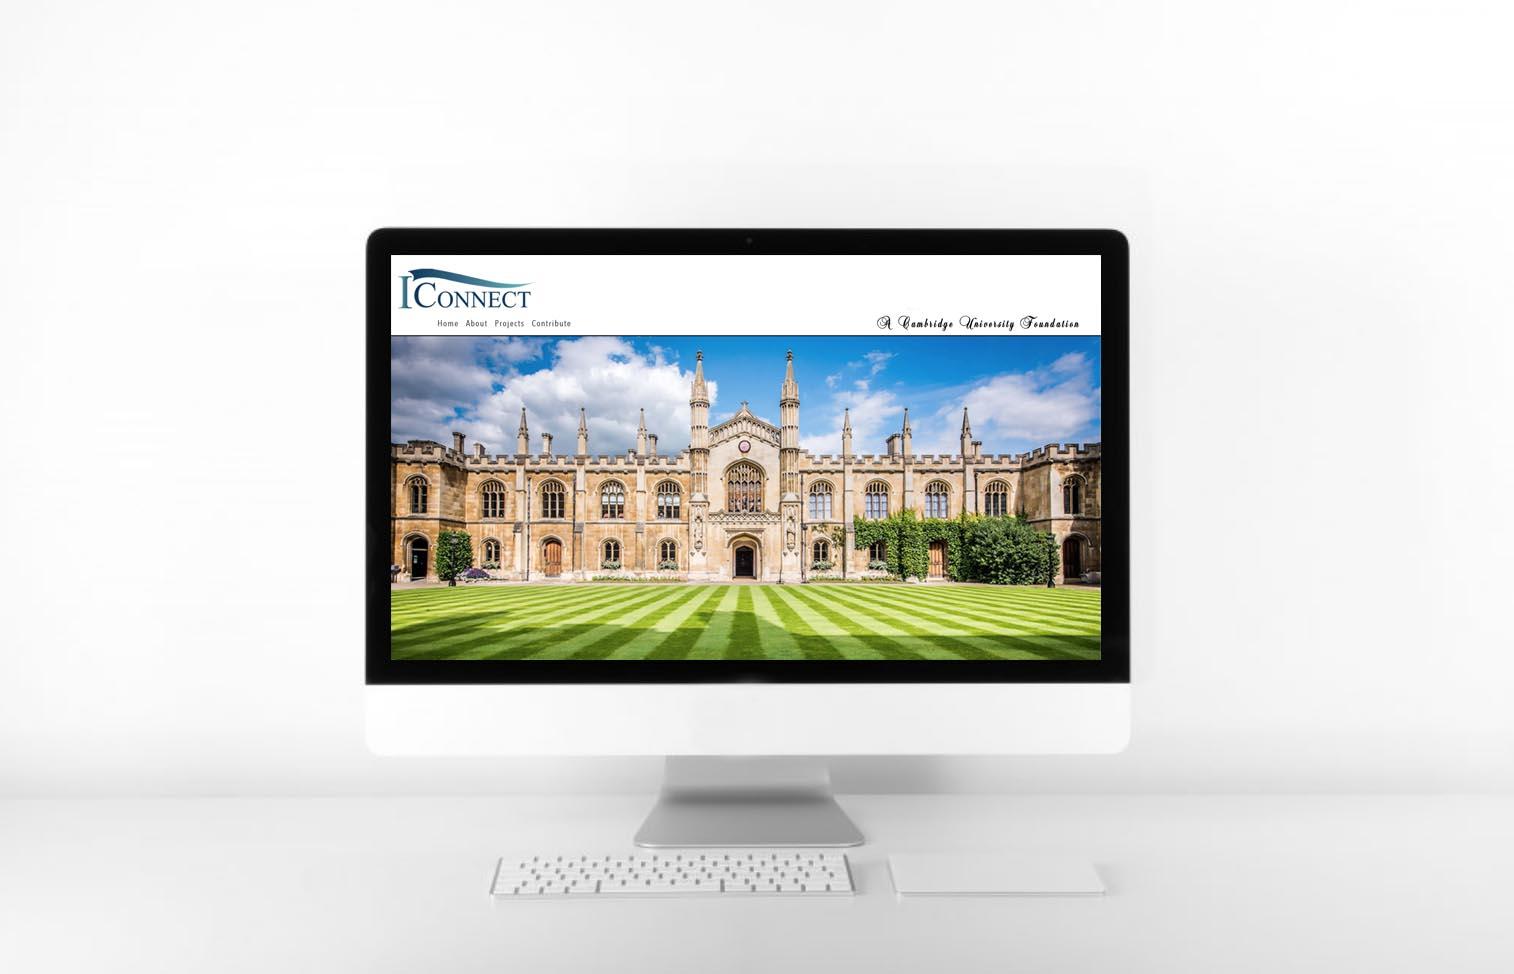 desktop-iconnect-website-design-company